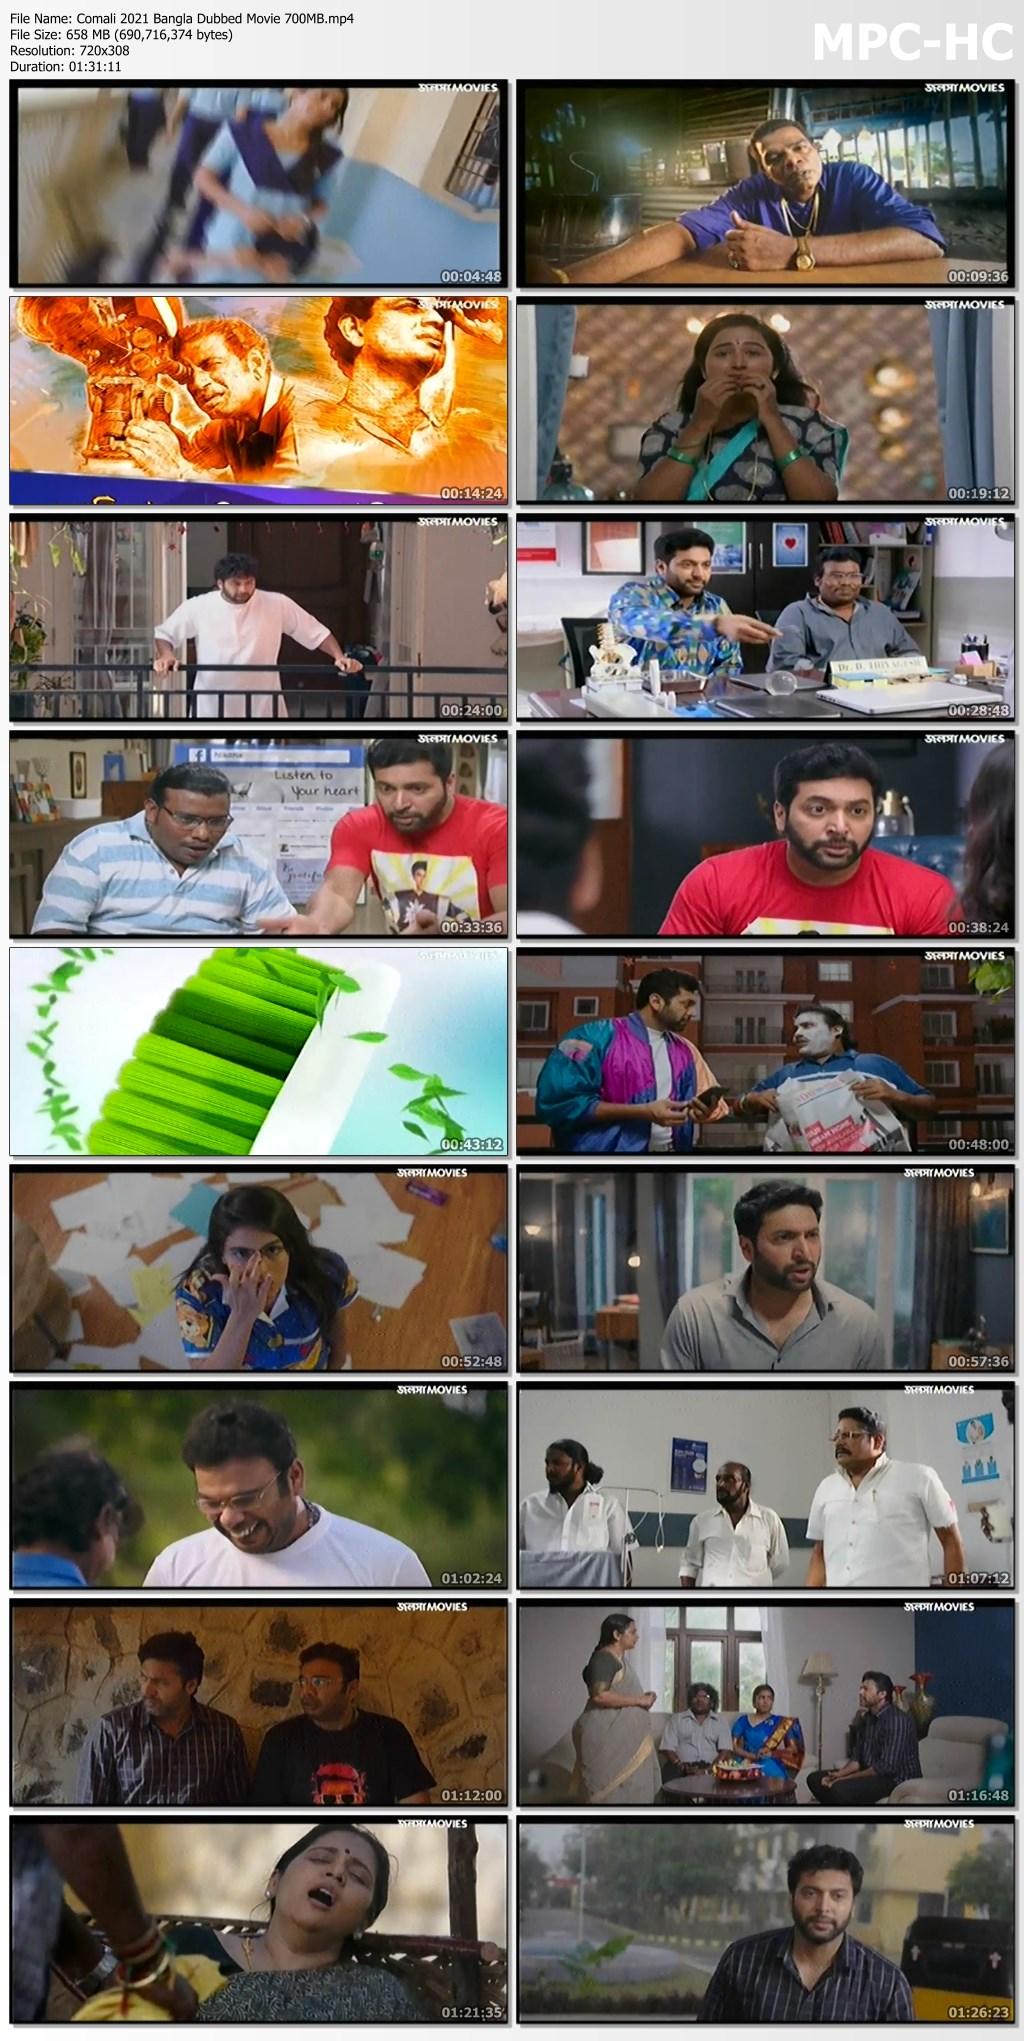 Comali 2021 Bangla Dubbed Movie 700MB.mp4 thumbs